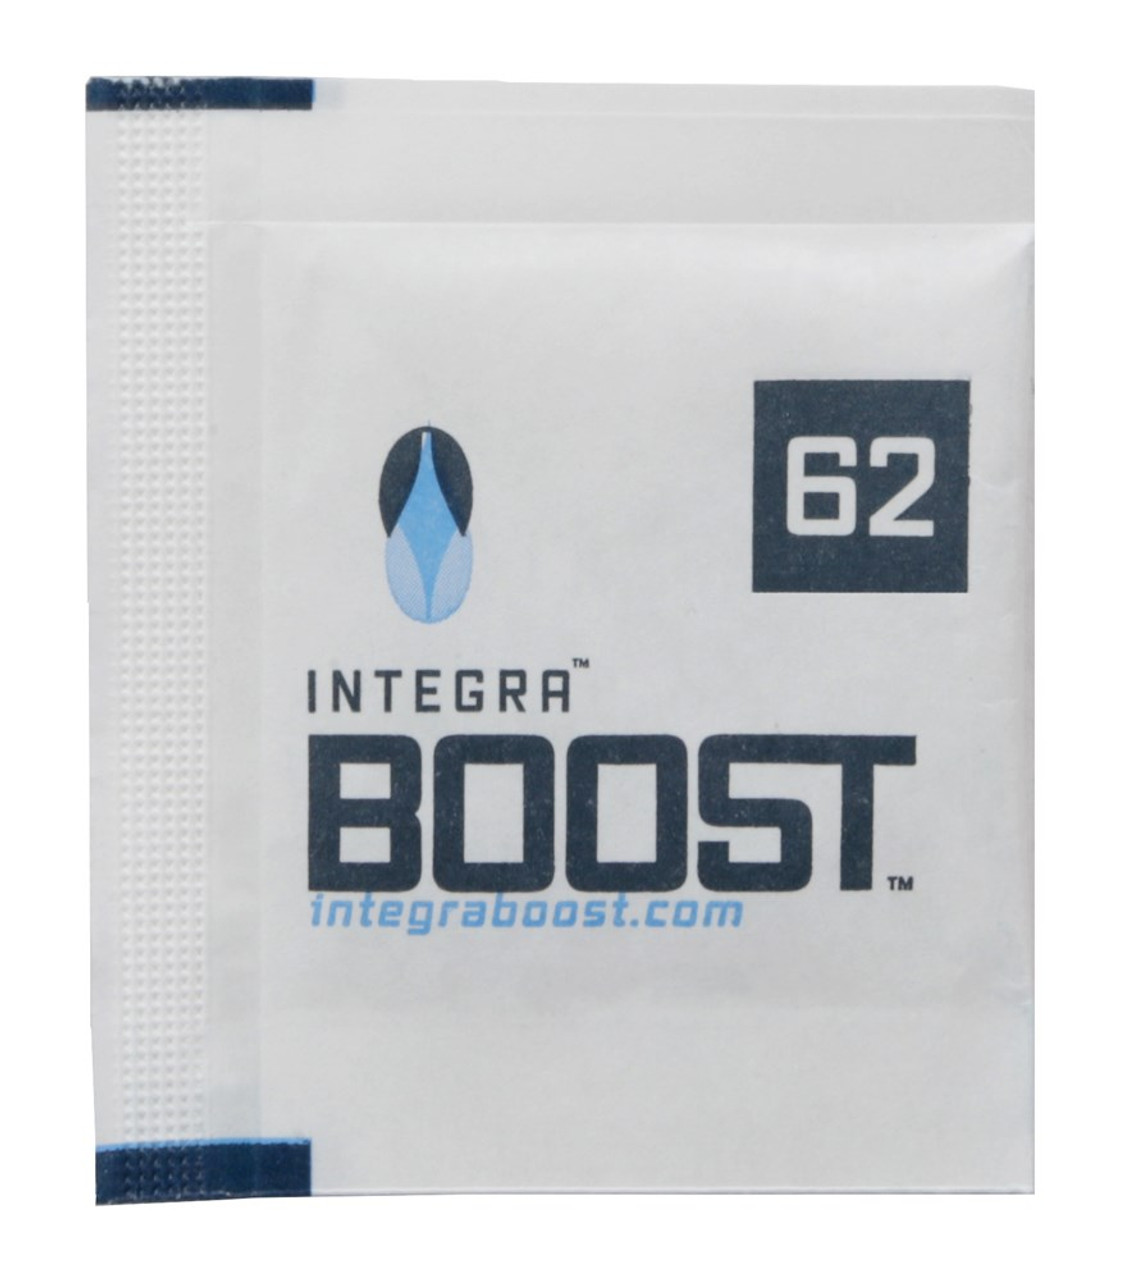 Integra Boost 4g pack SM 62% RH Each CASE of 600